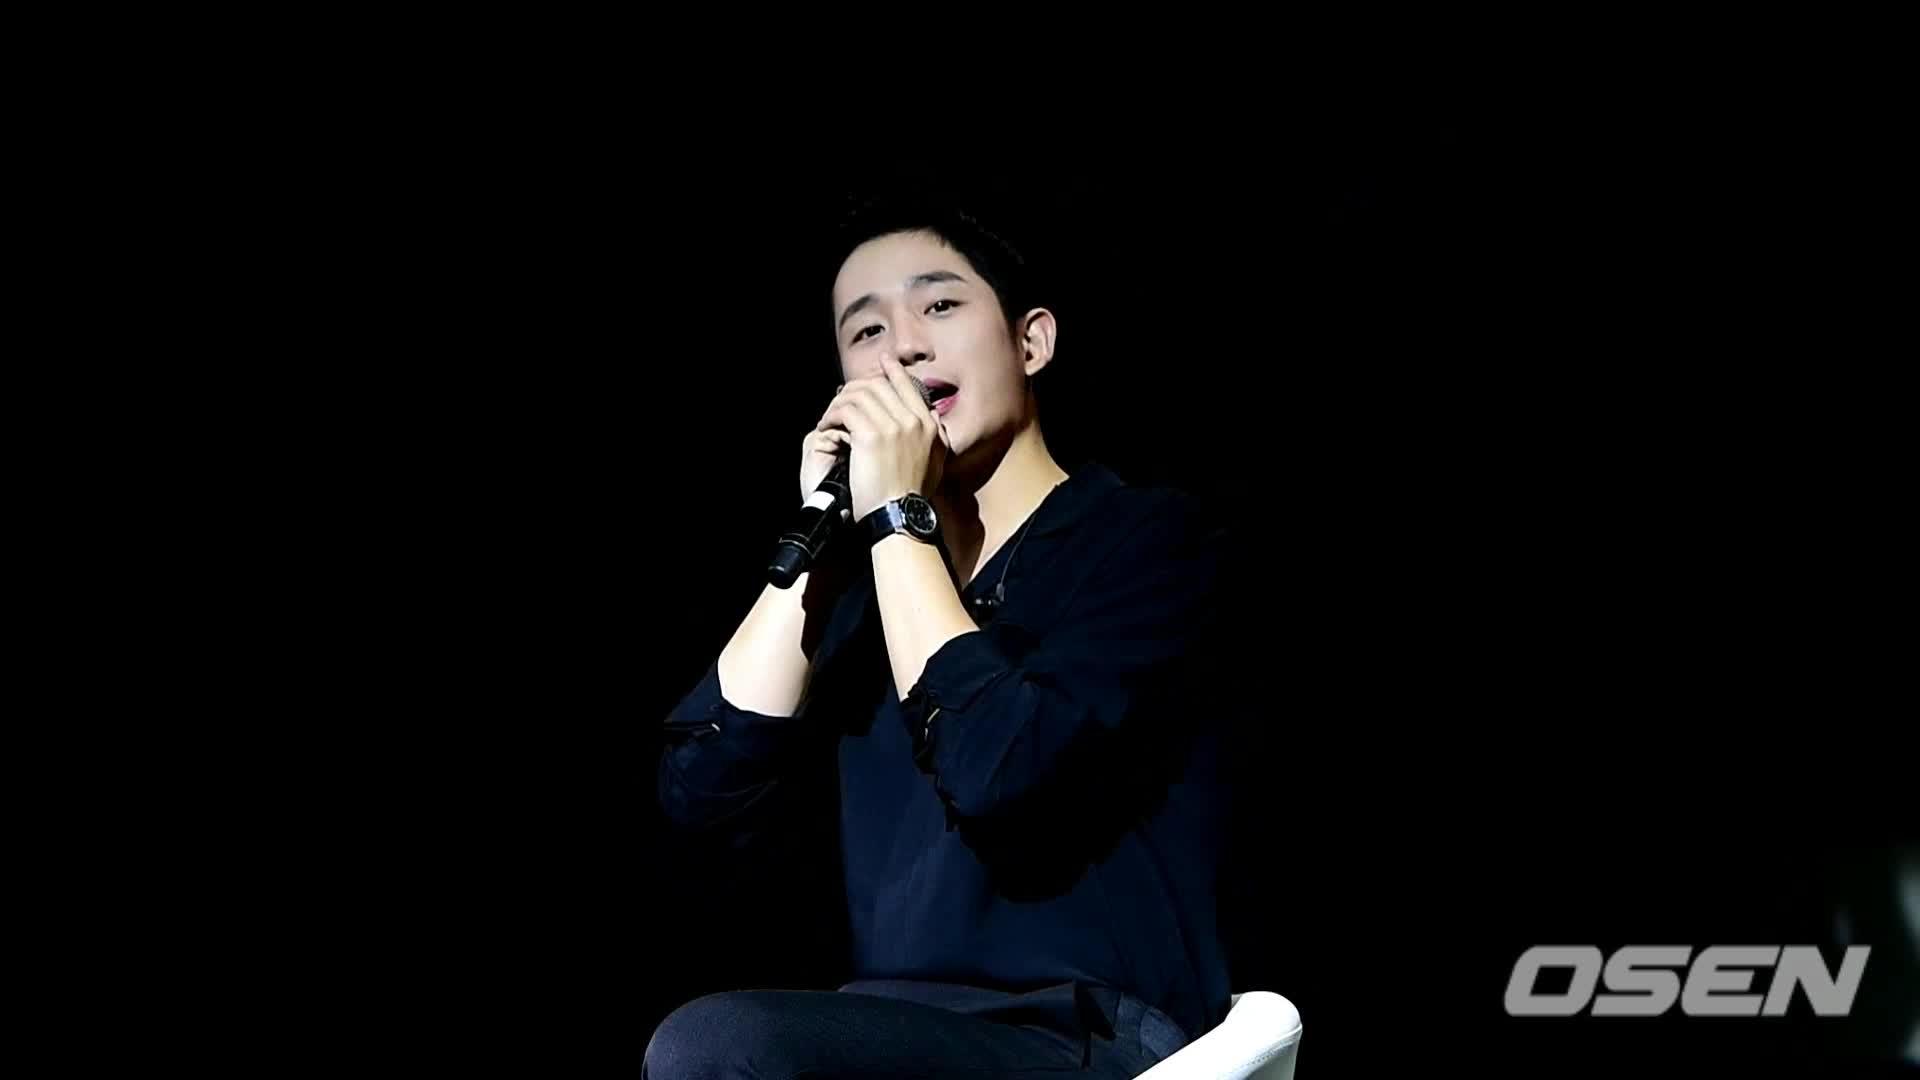 Jung Hae In 정해인's 팬미팅 비하인드(feat. 너의 의미)